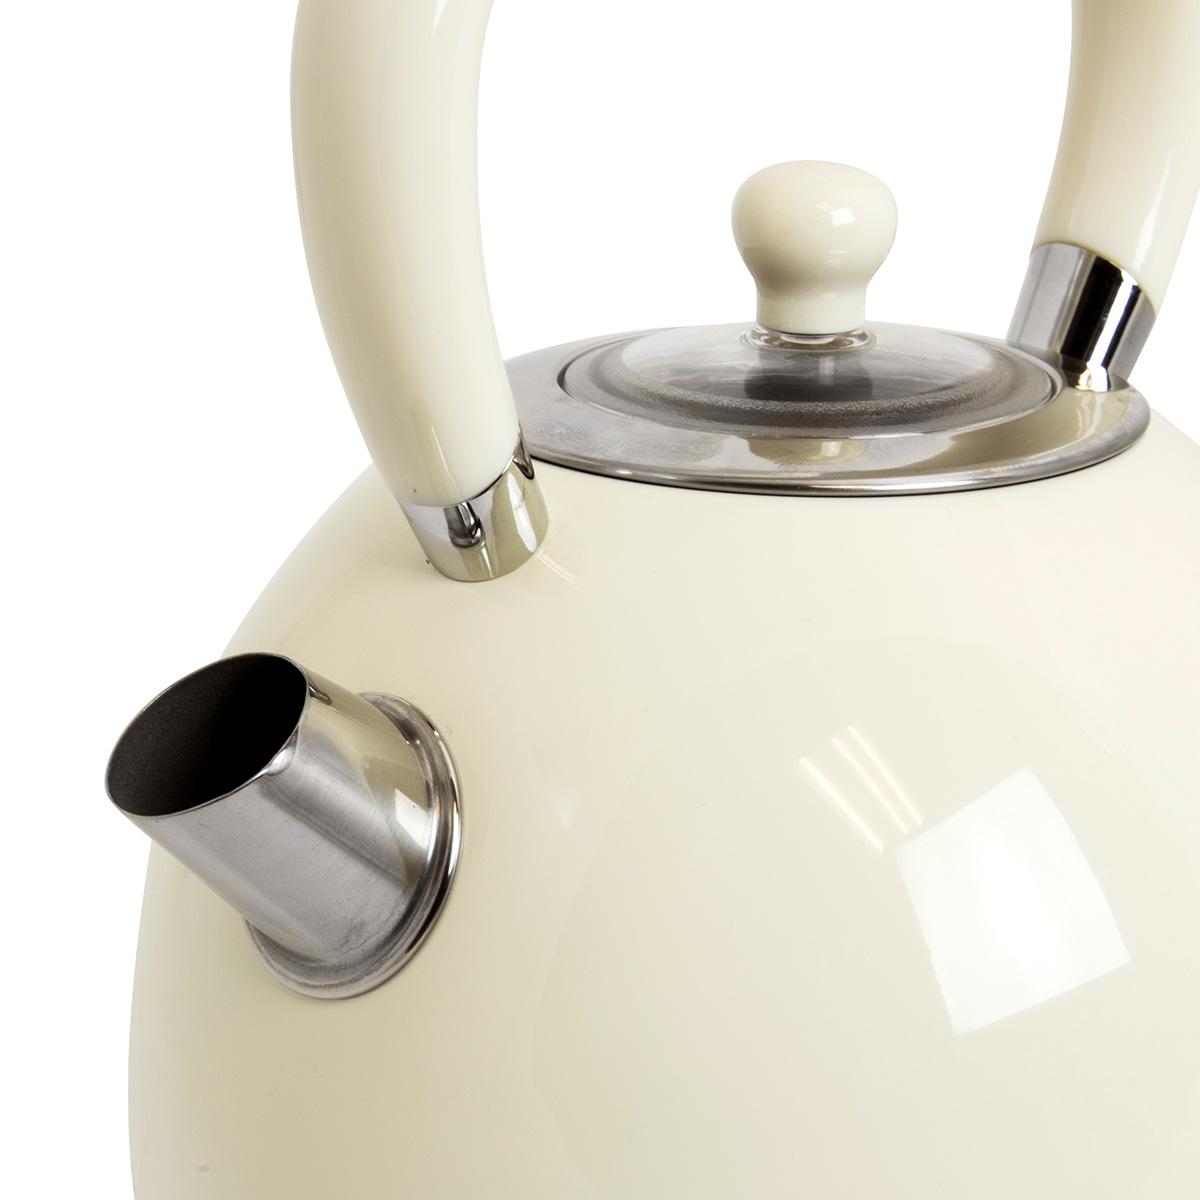 Charles Bentley 3000W 1.7 Litre Cream Dome Kettle Fast Boil 360 Swivel Base